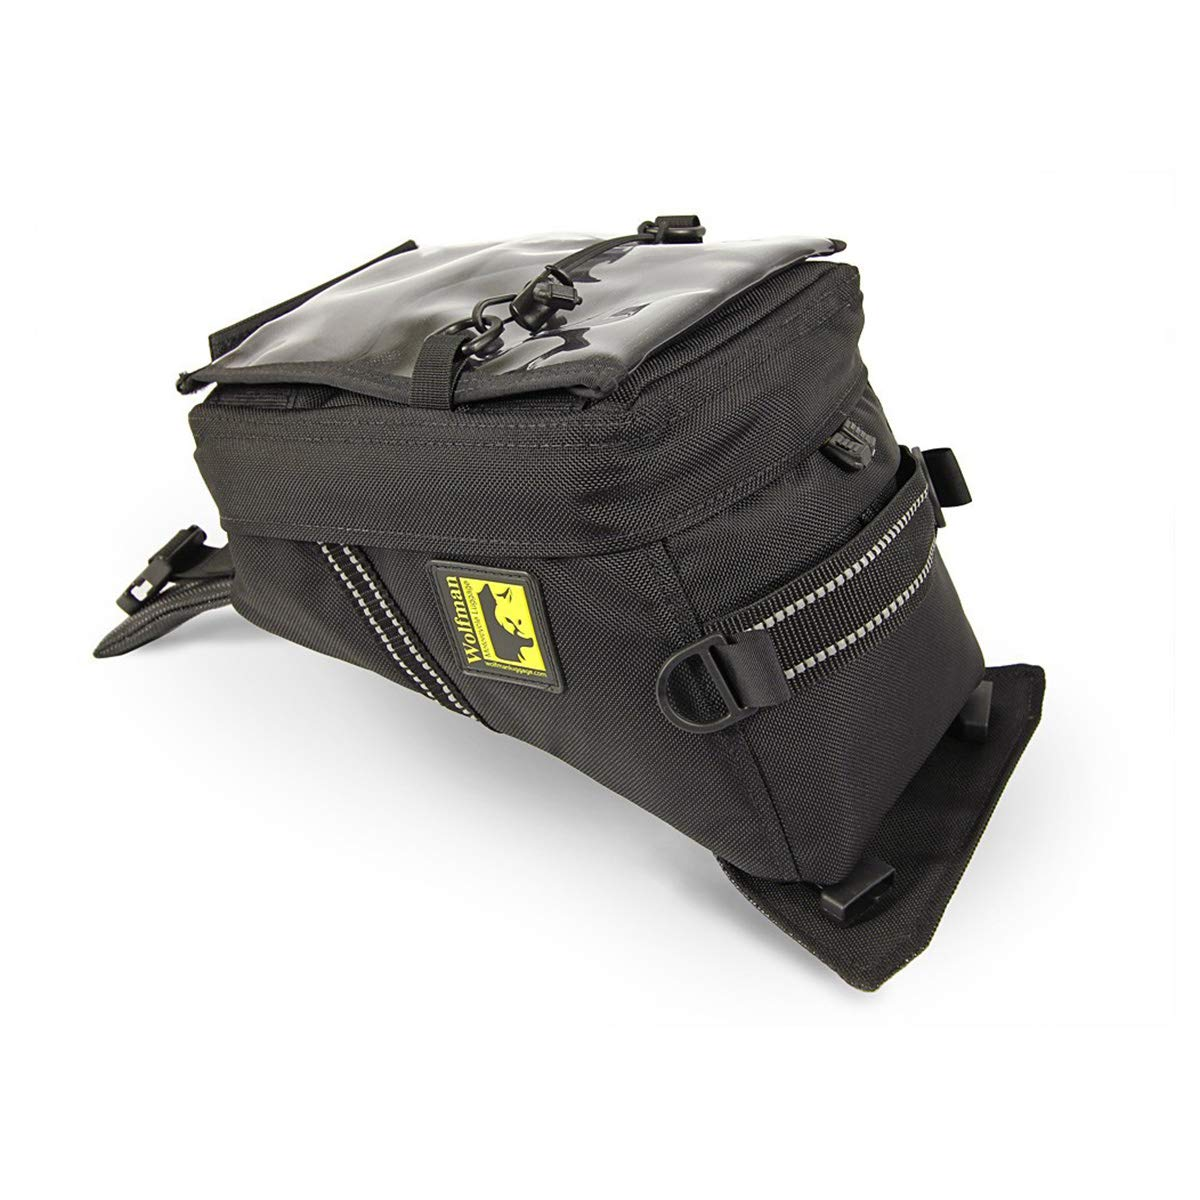 Wolfman Luggage S0305 Blackhawk Tank Bag V-1.7